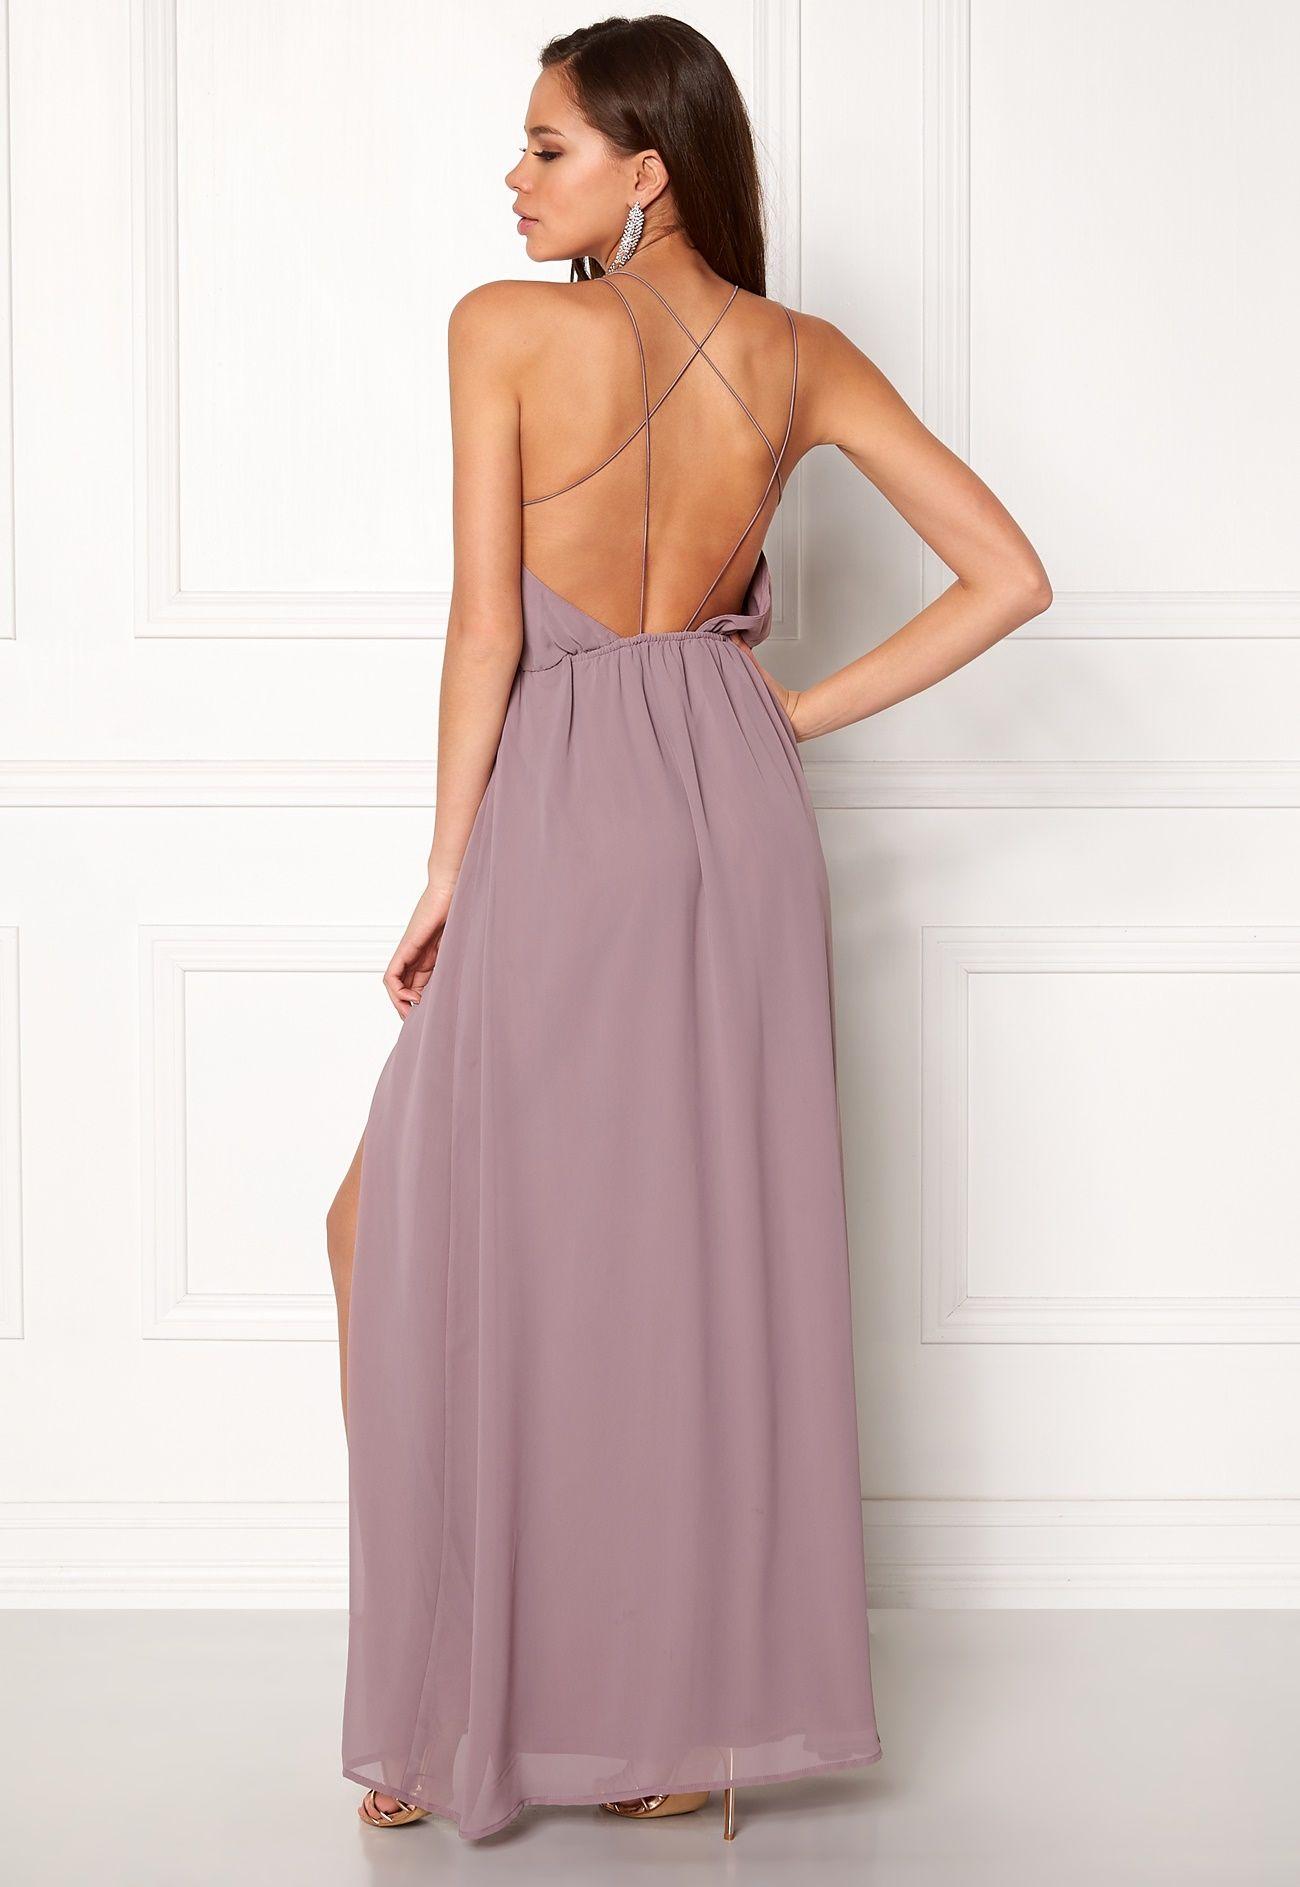 b9ff11d6034 Make Way Sierra Prom Dress Dusty lilac - Bubbleroom   team bride ...